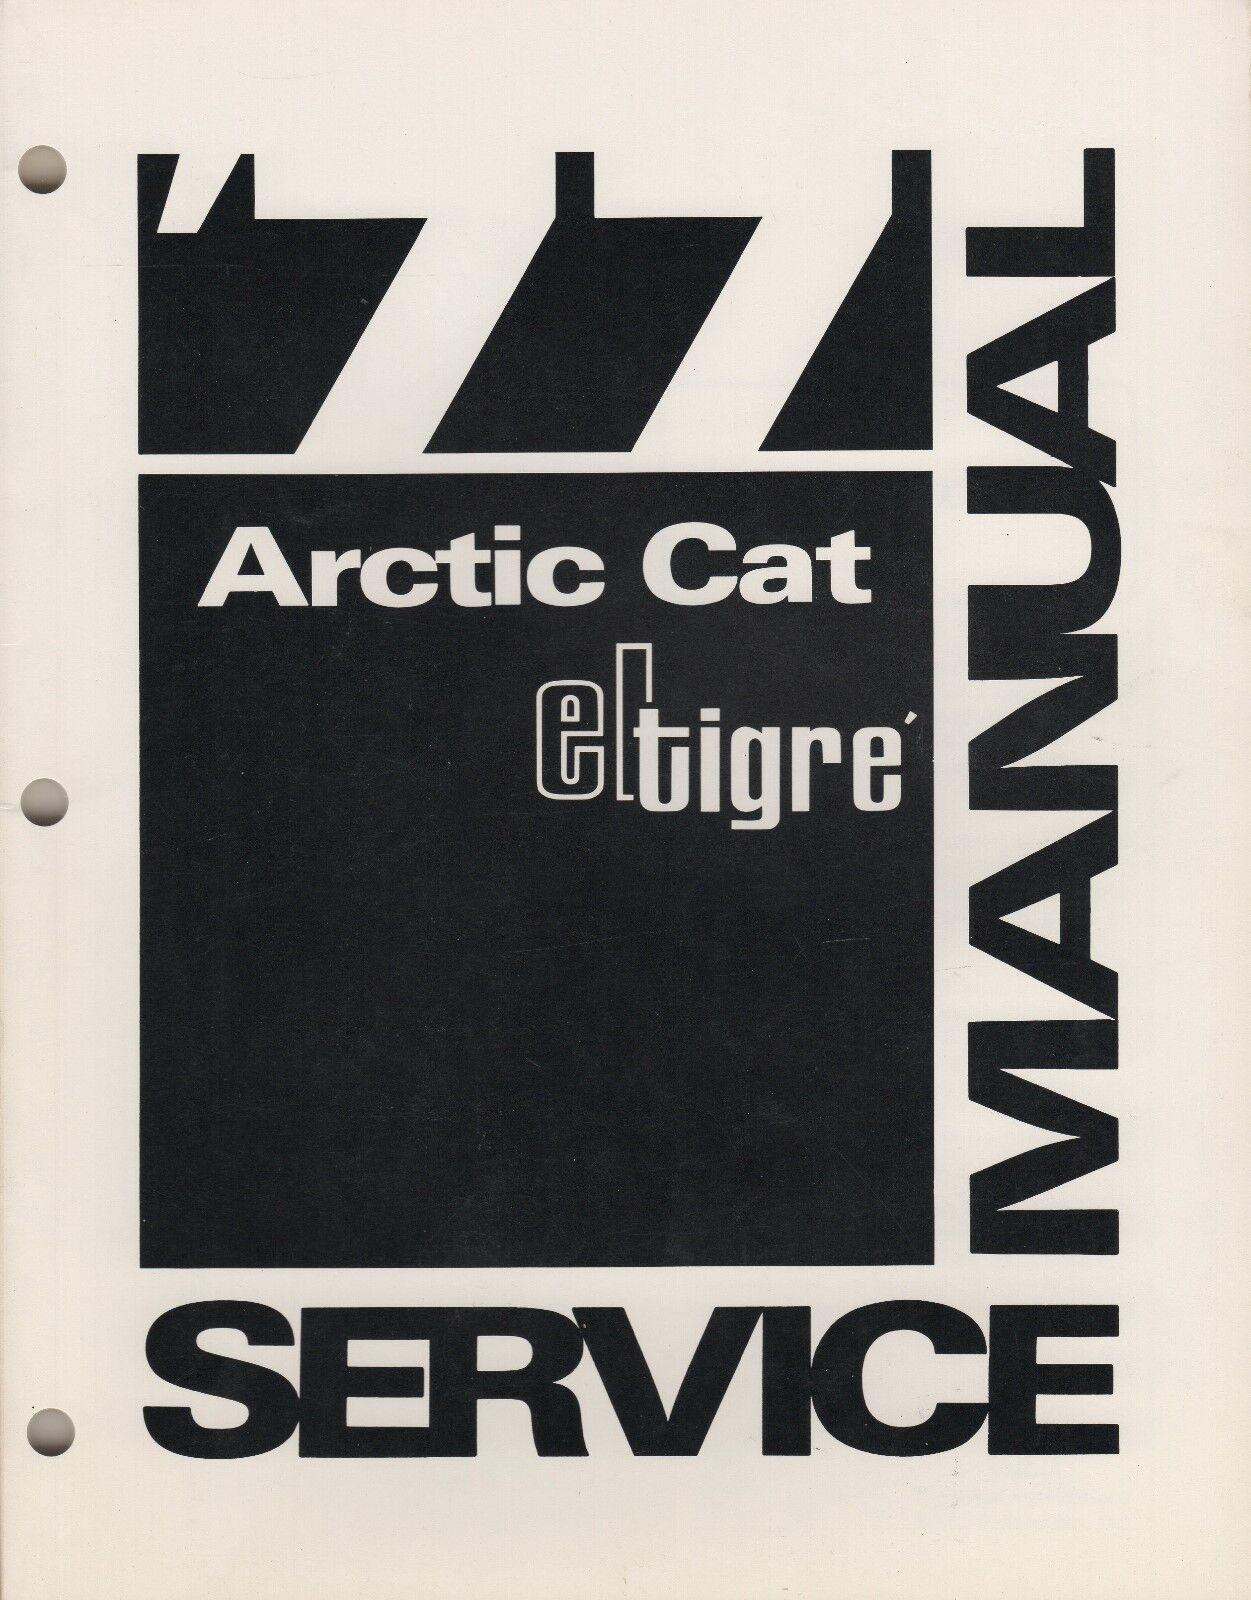 1977 ARCTIC CAT EL TIGRE' SNOWMOBILE SERVICE MANUAL P N 0153-123 (267)